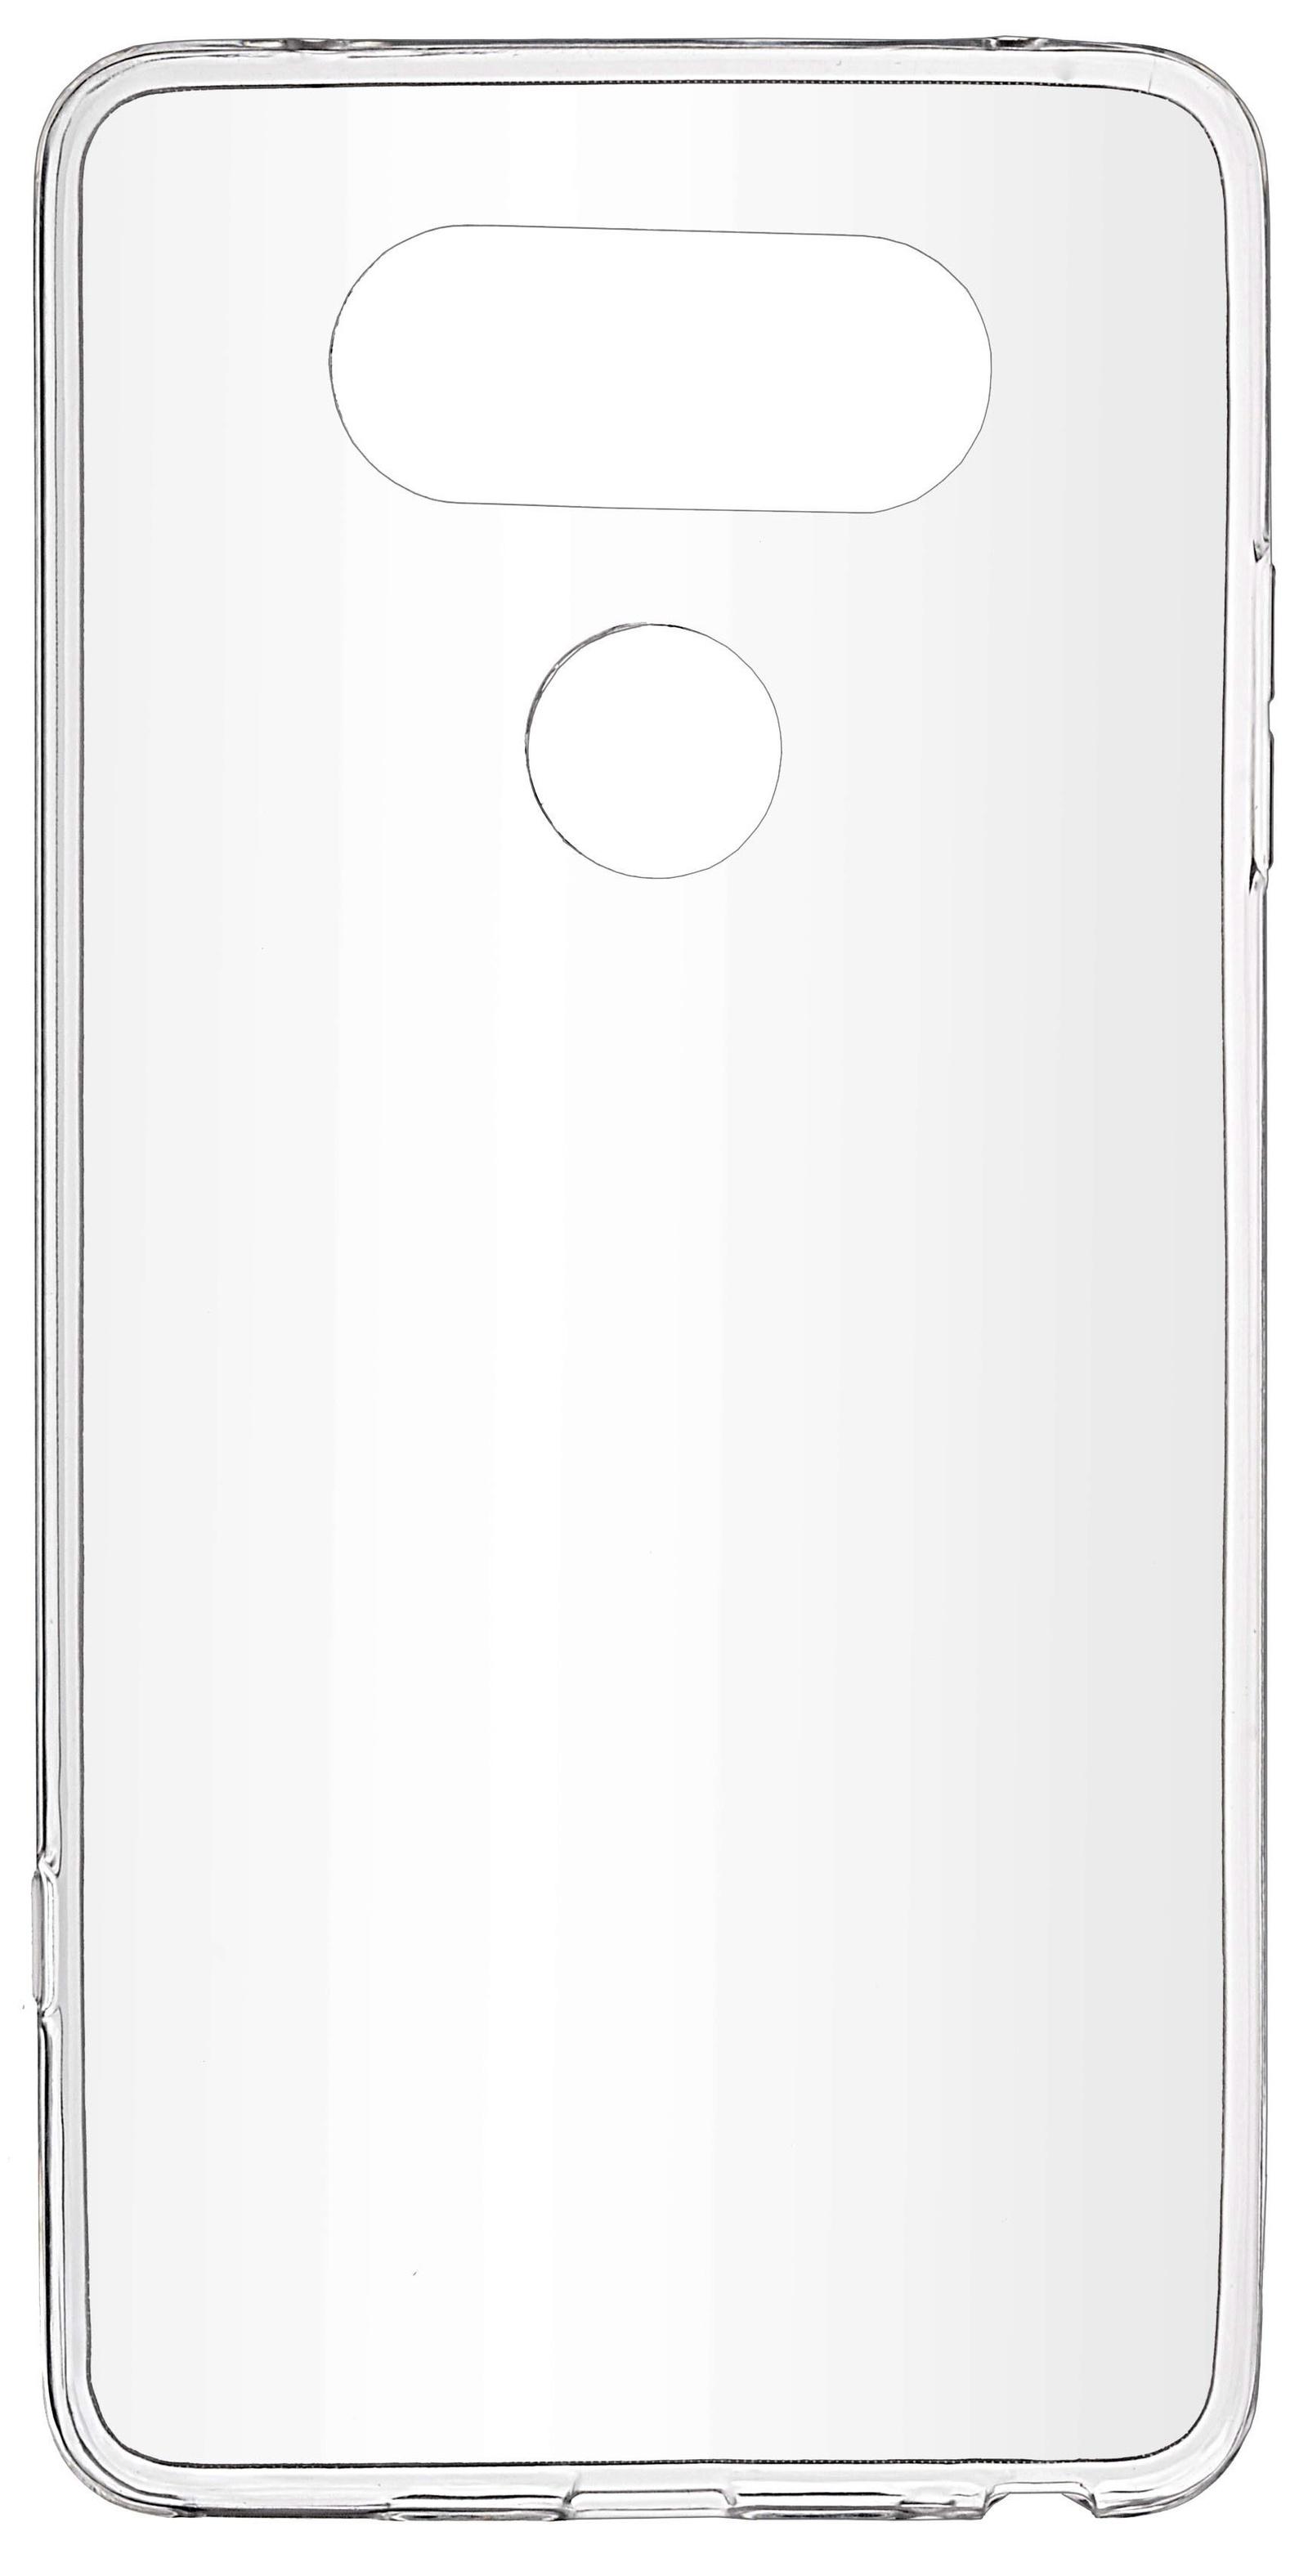 Чехол для сотового телефона skinBOX Slim Silicone, 4630042524712, прозрачный чехол для xiaomi redmi pro skinbox 4people slim silicone case прозрачный